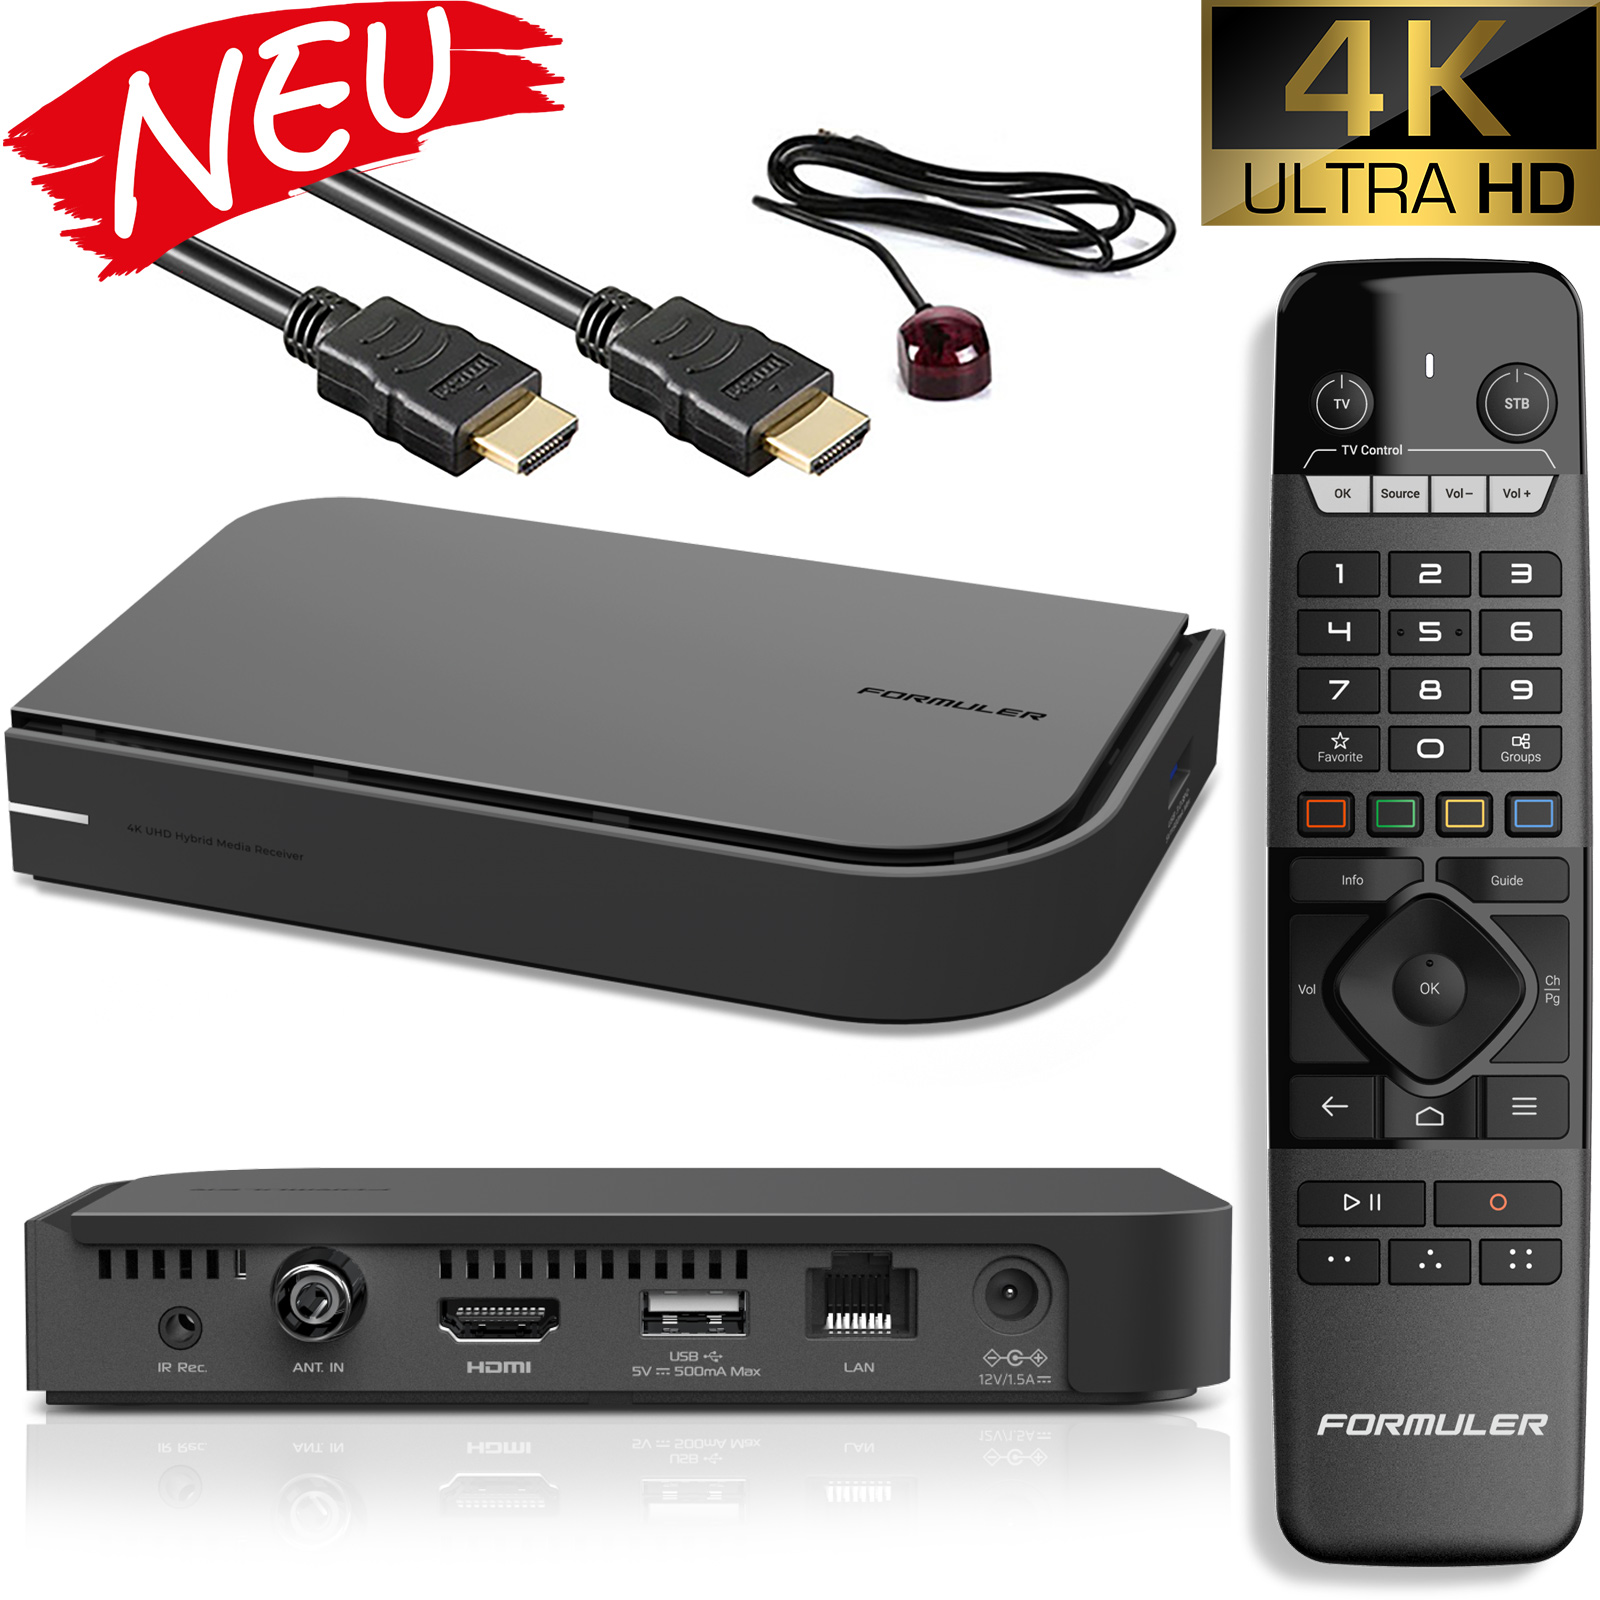 Formuler CC 4K UHD TV IP 2.4/5GHz Dual WiFi Android 7.0 Mediaplayer mit DVB-T/C Hybrid Tuner Schwarz